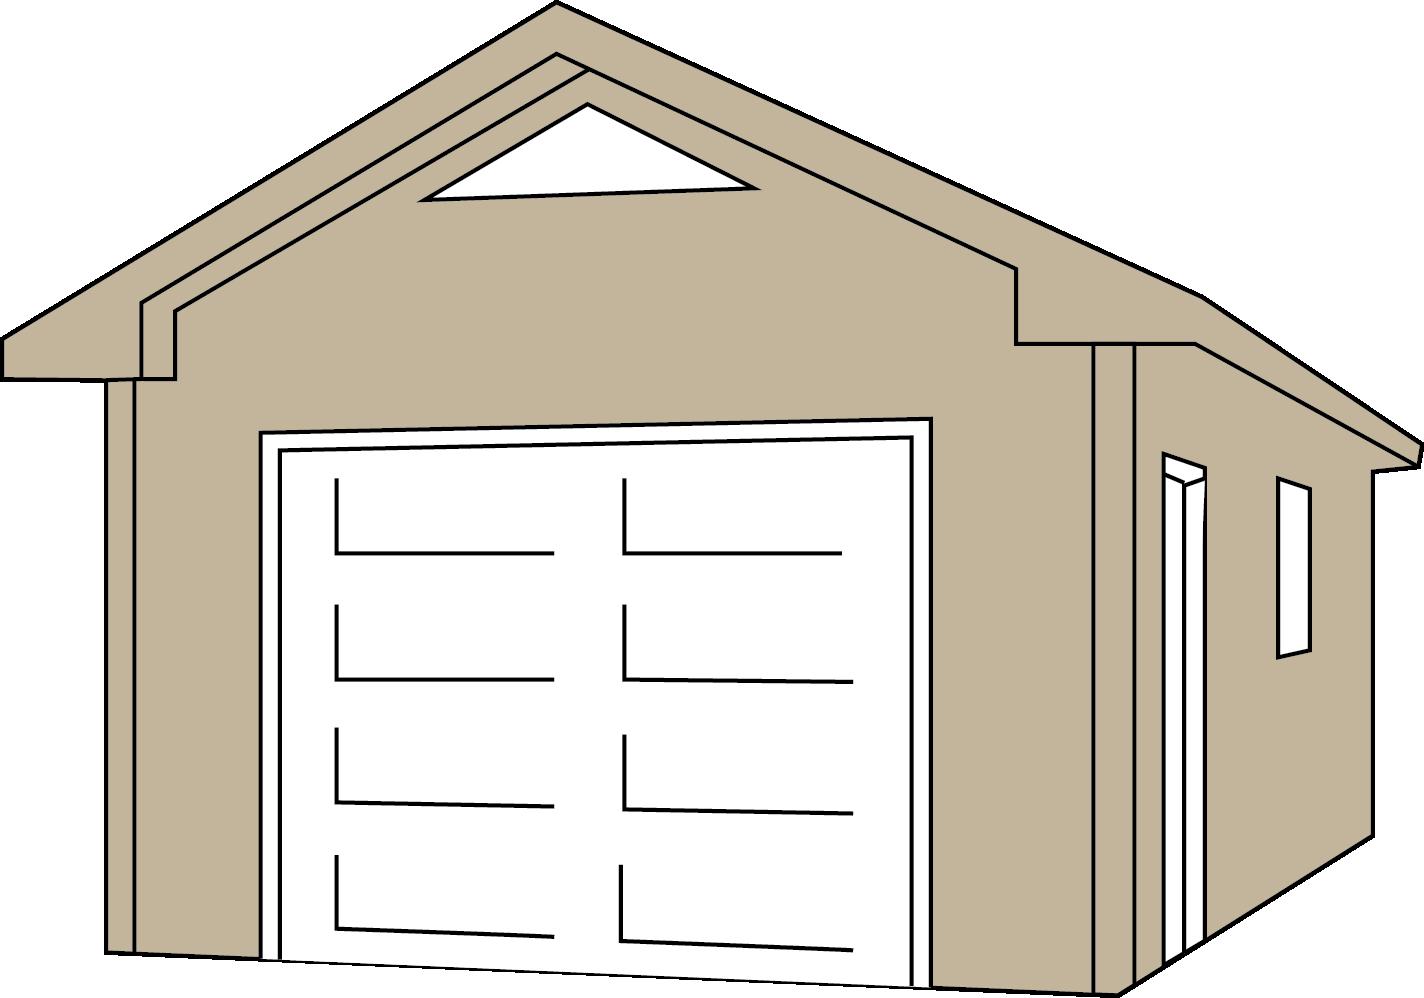 Plans red umbrella contractors. Clipart house garage